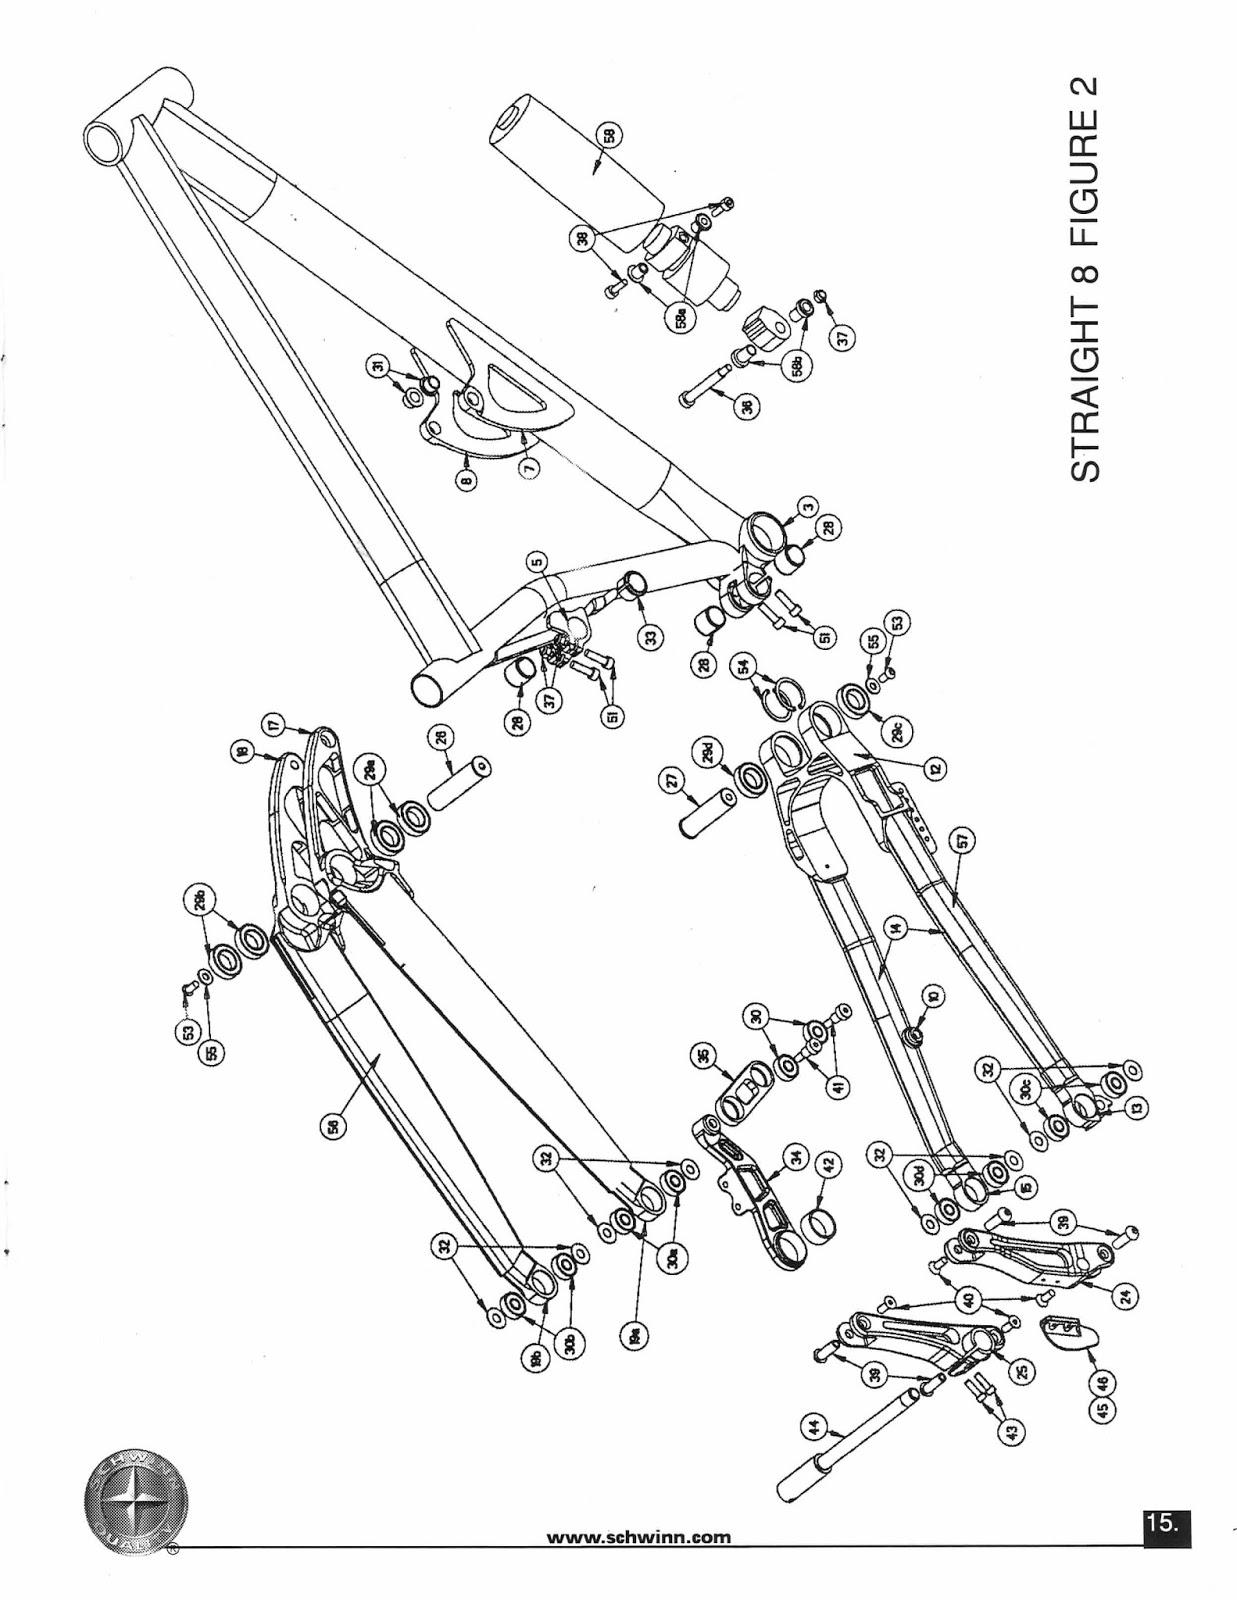 The Old Bike Shop: Schwinn suspension manual